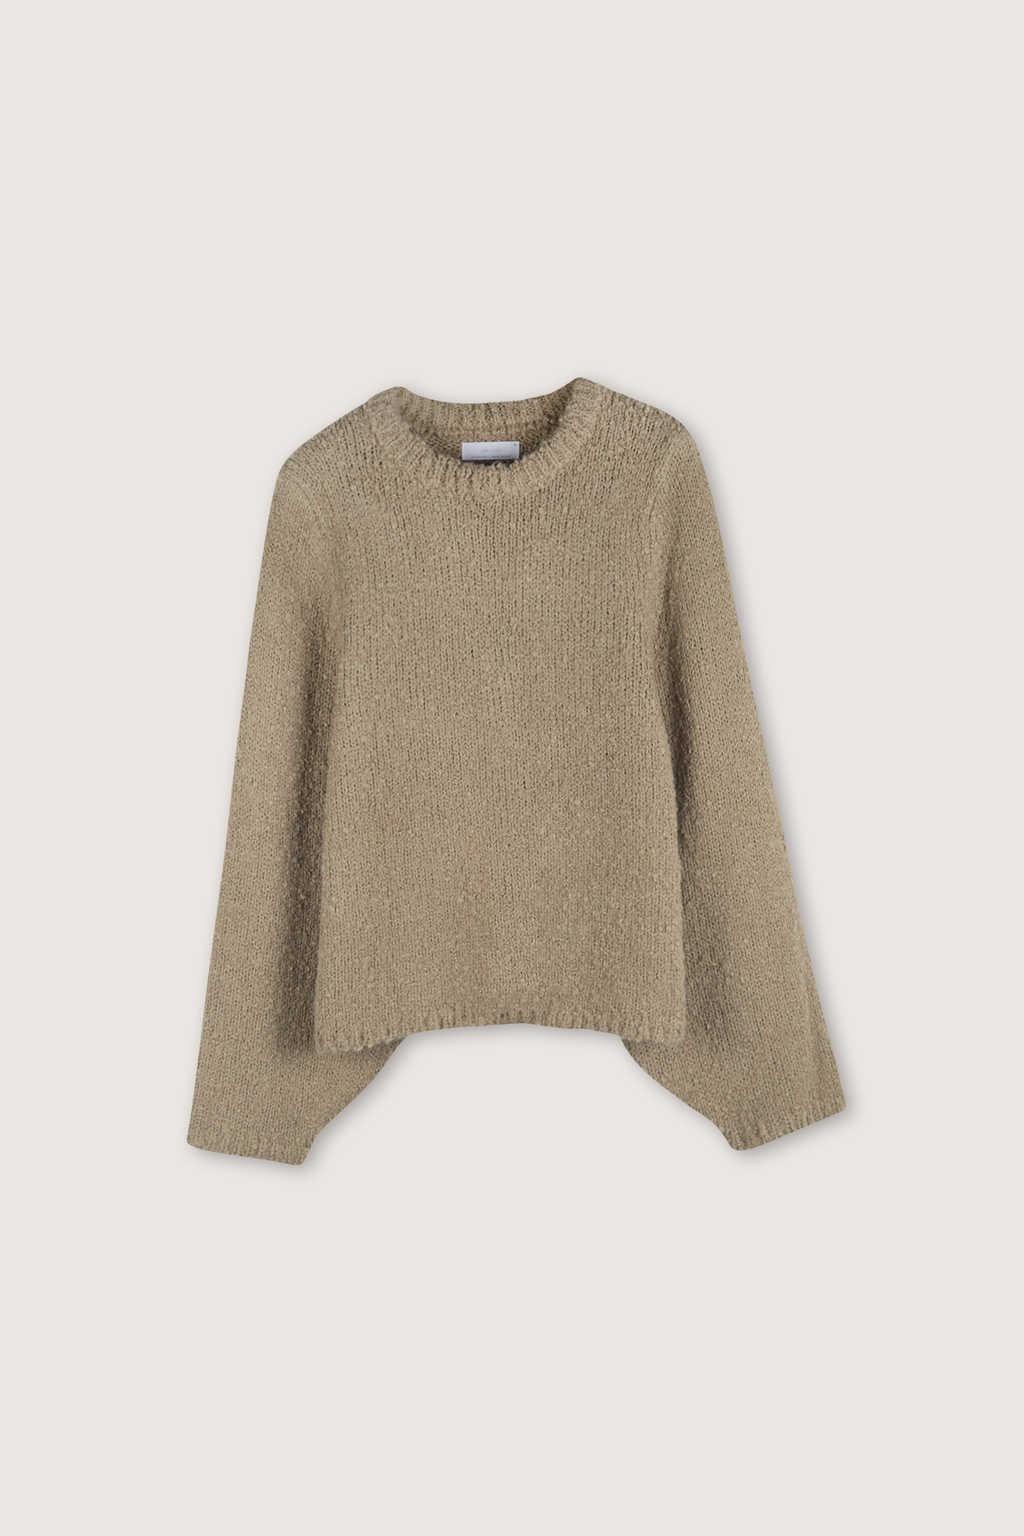 Sweater 1953 Beige 10